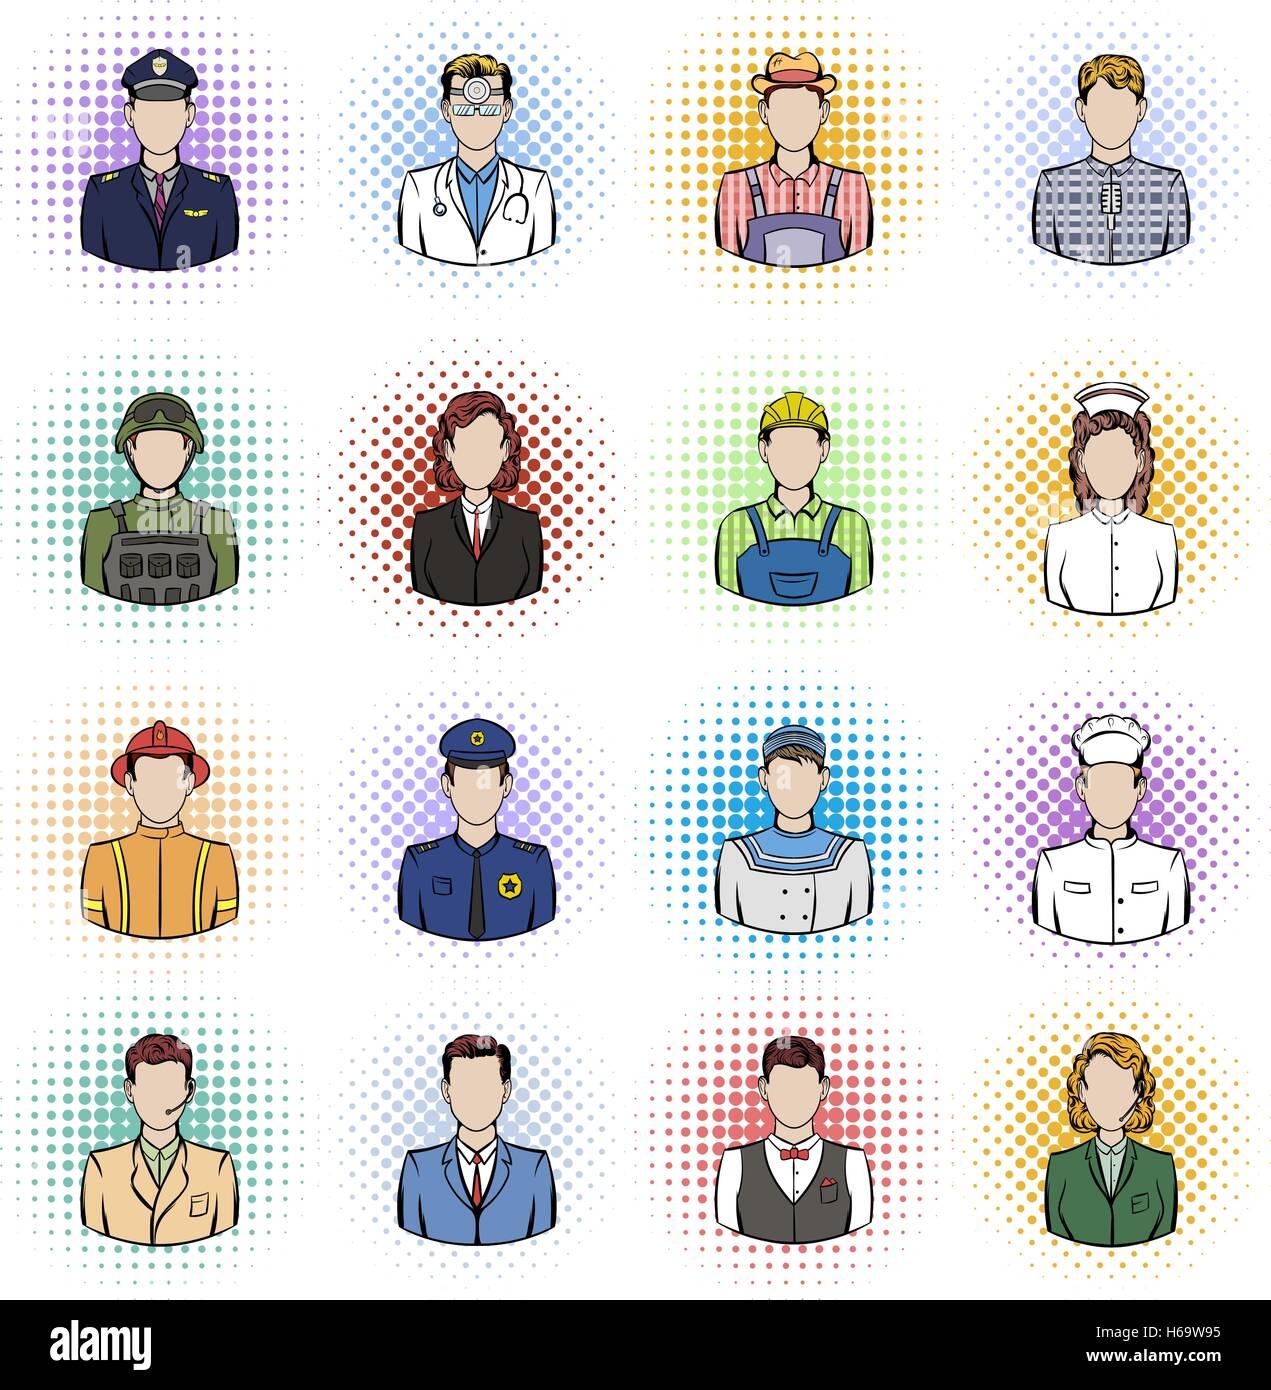 Profession comics icons set - Stock Vector